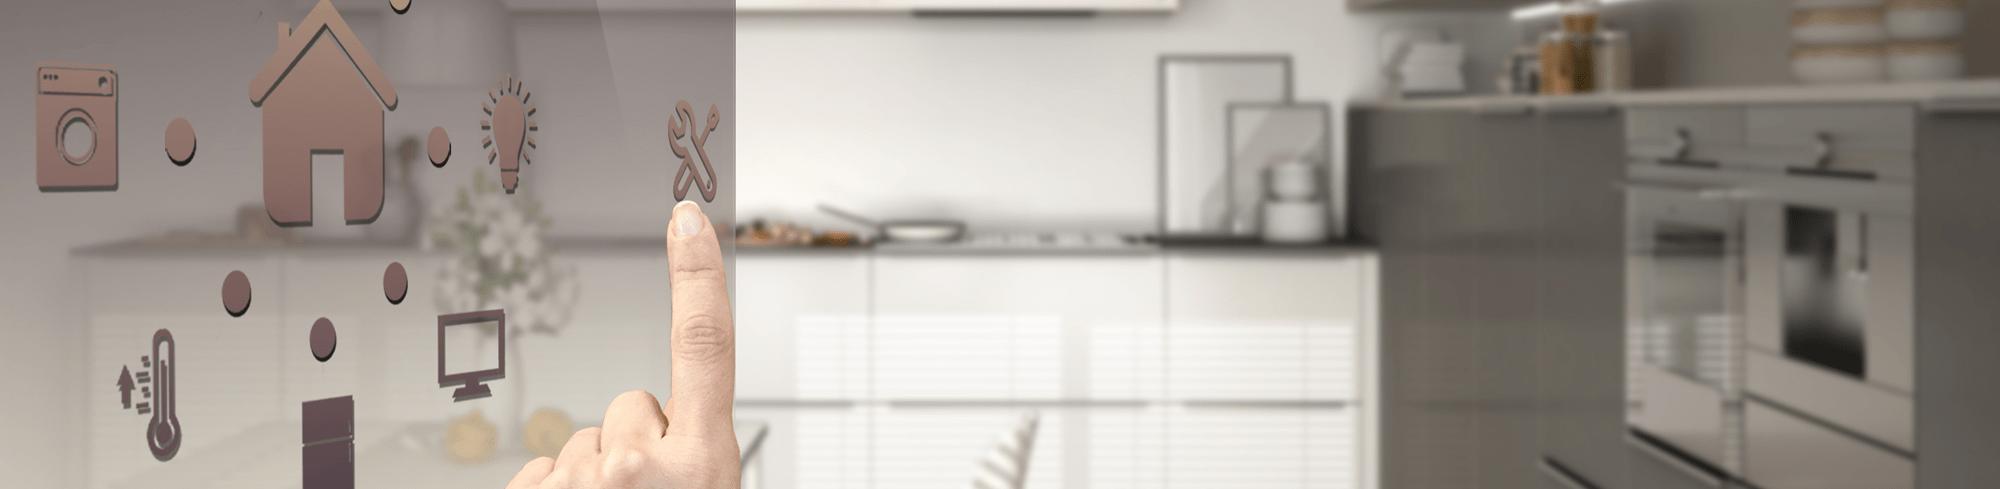 virtual kitchen shabby chic stools custom mississauga cgd cabinetry